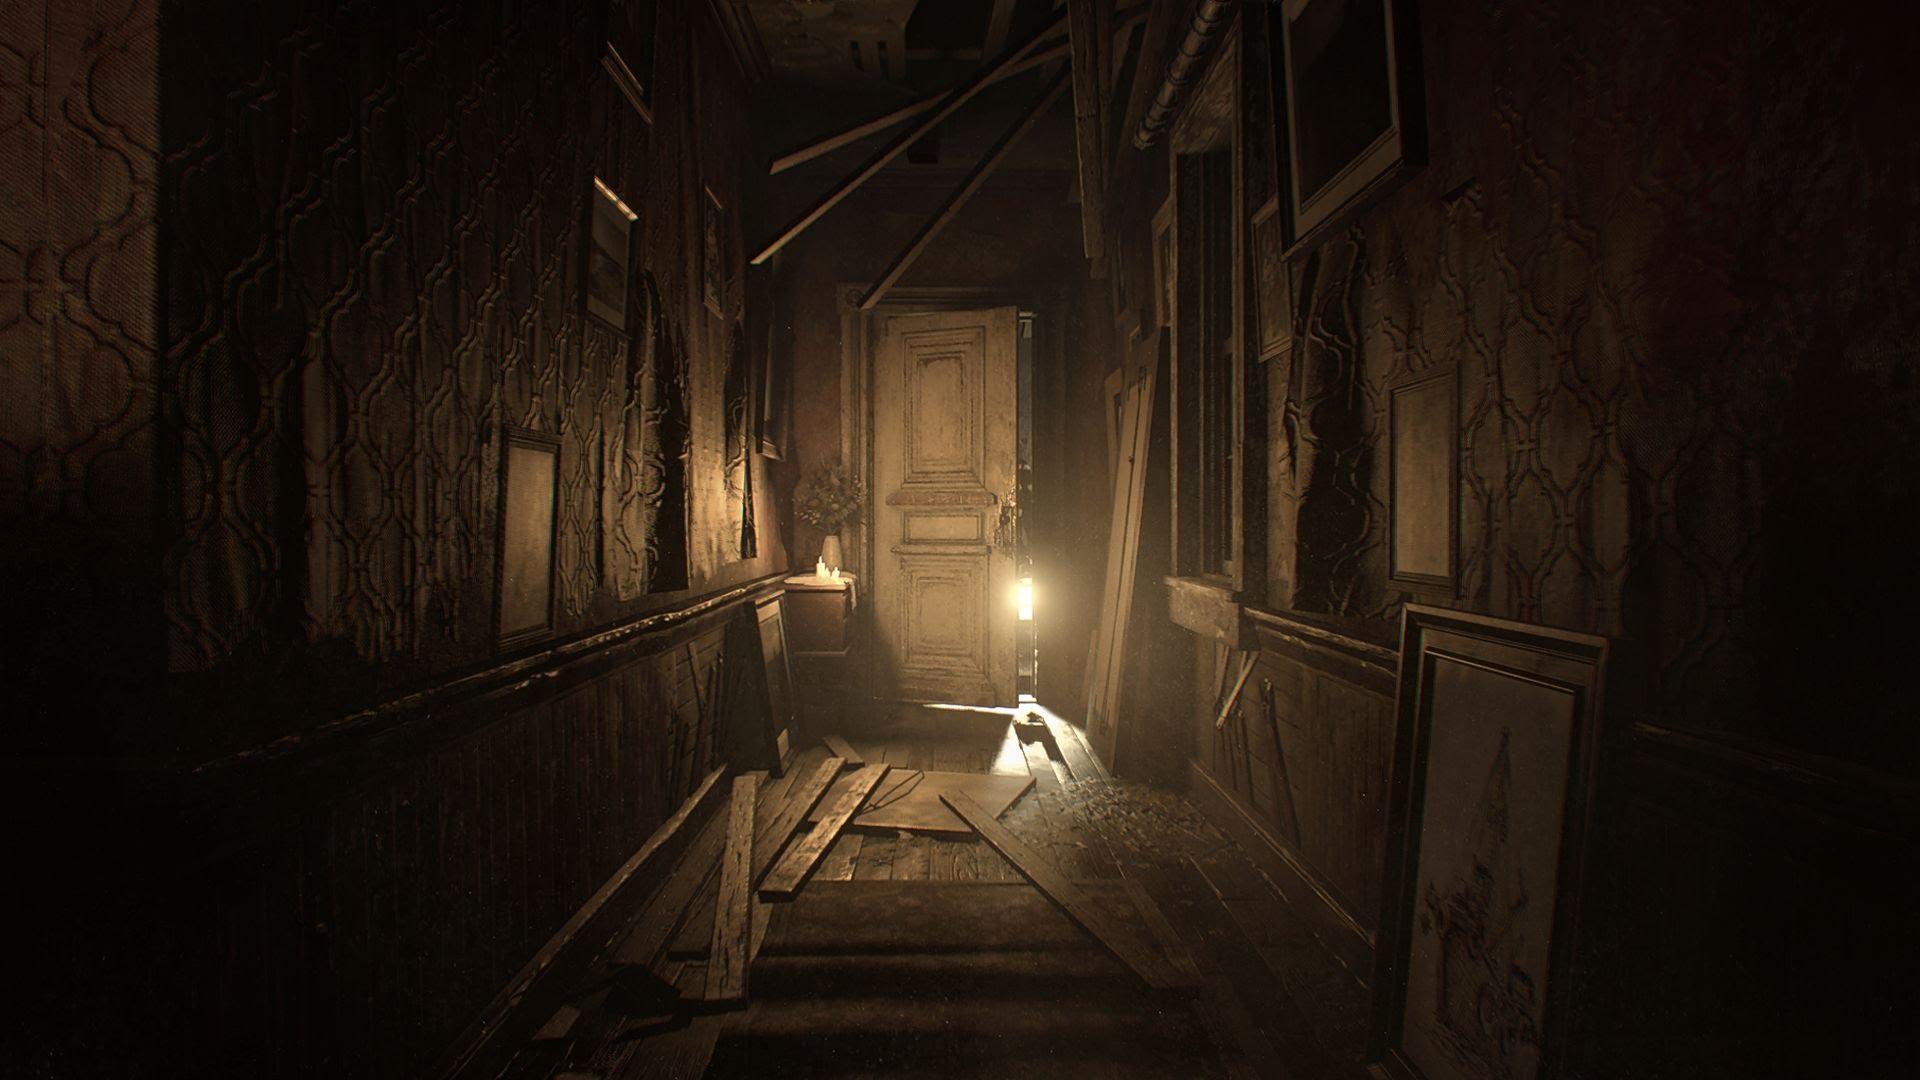 maxresdefault - أفضل ألعاب النجاة من الصعوبات الهائلة على Resident Evil 7 biohazard - PS4